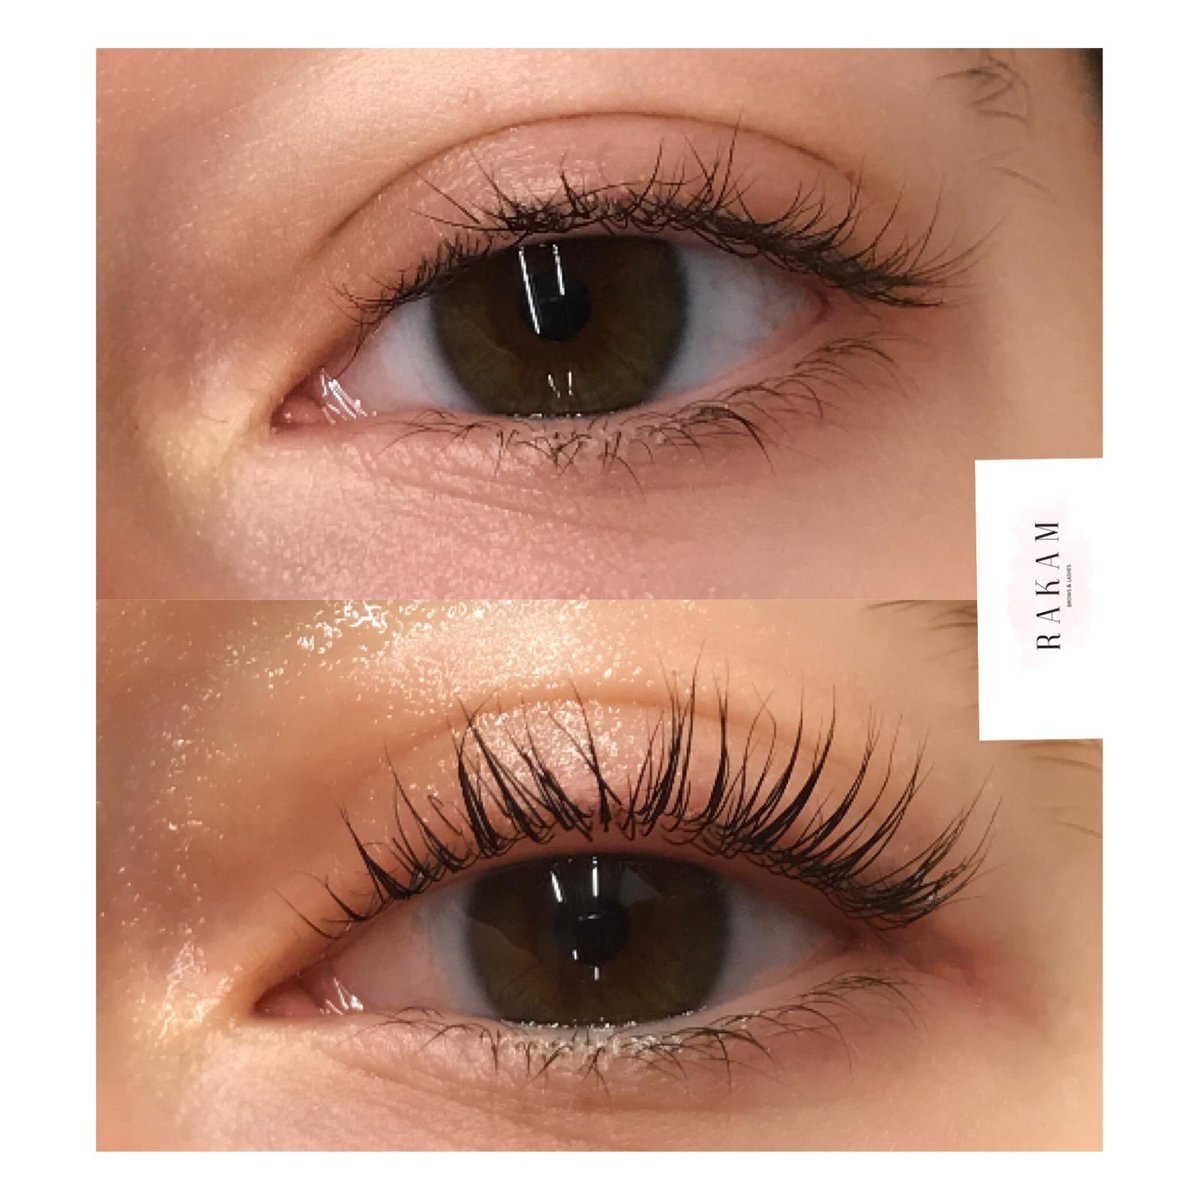 d439881f550 ... enhancing the length and fullness of your lashes. #EyeLashes  #Enhancement #Fullness #Consultation #Serum #Keratin #Tint #BeforeAfter  #Treatment #Natural ...